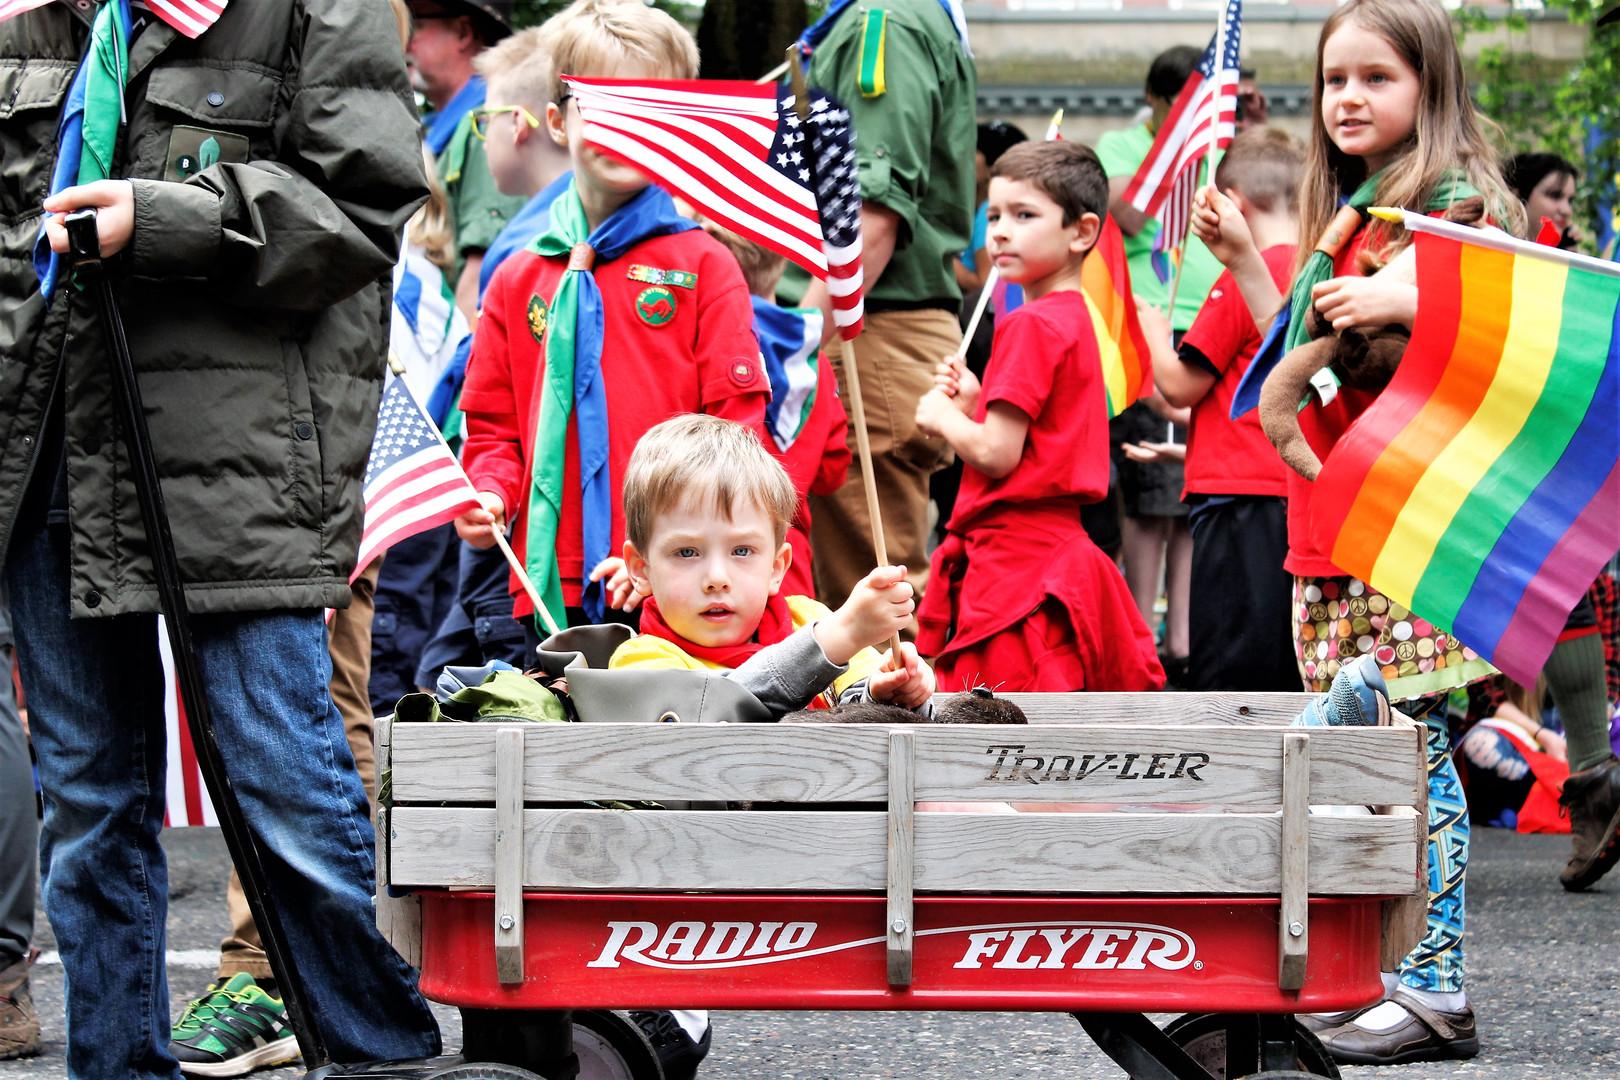 Wagon Child